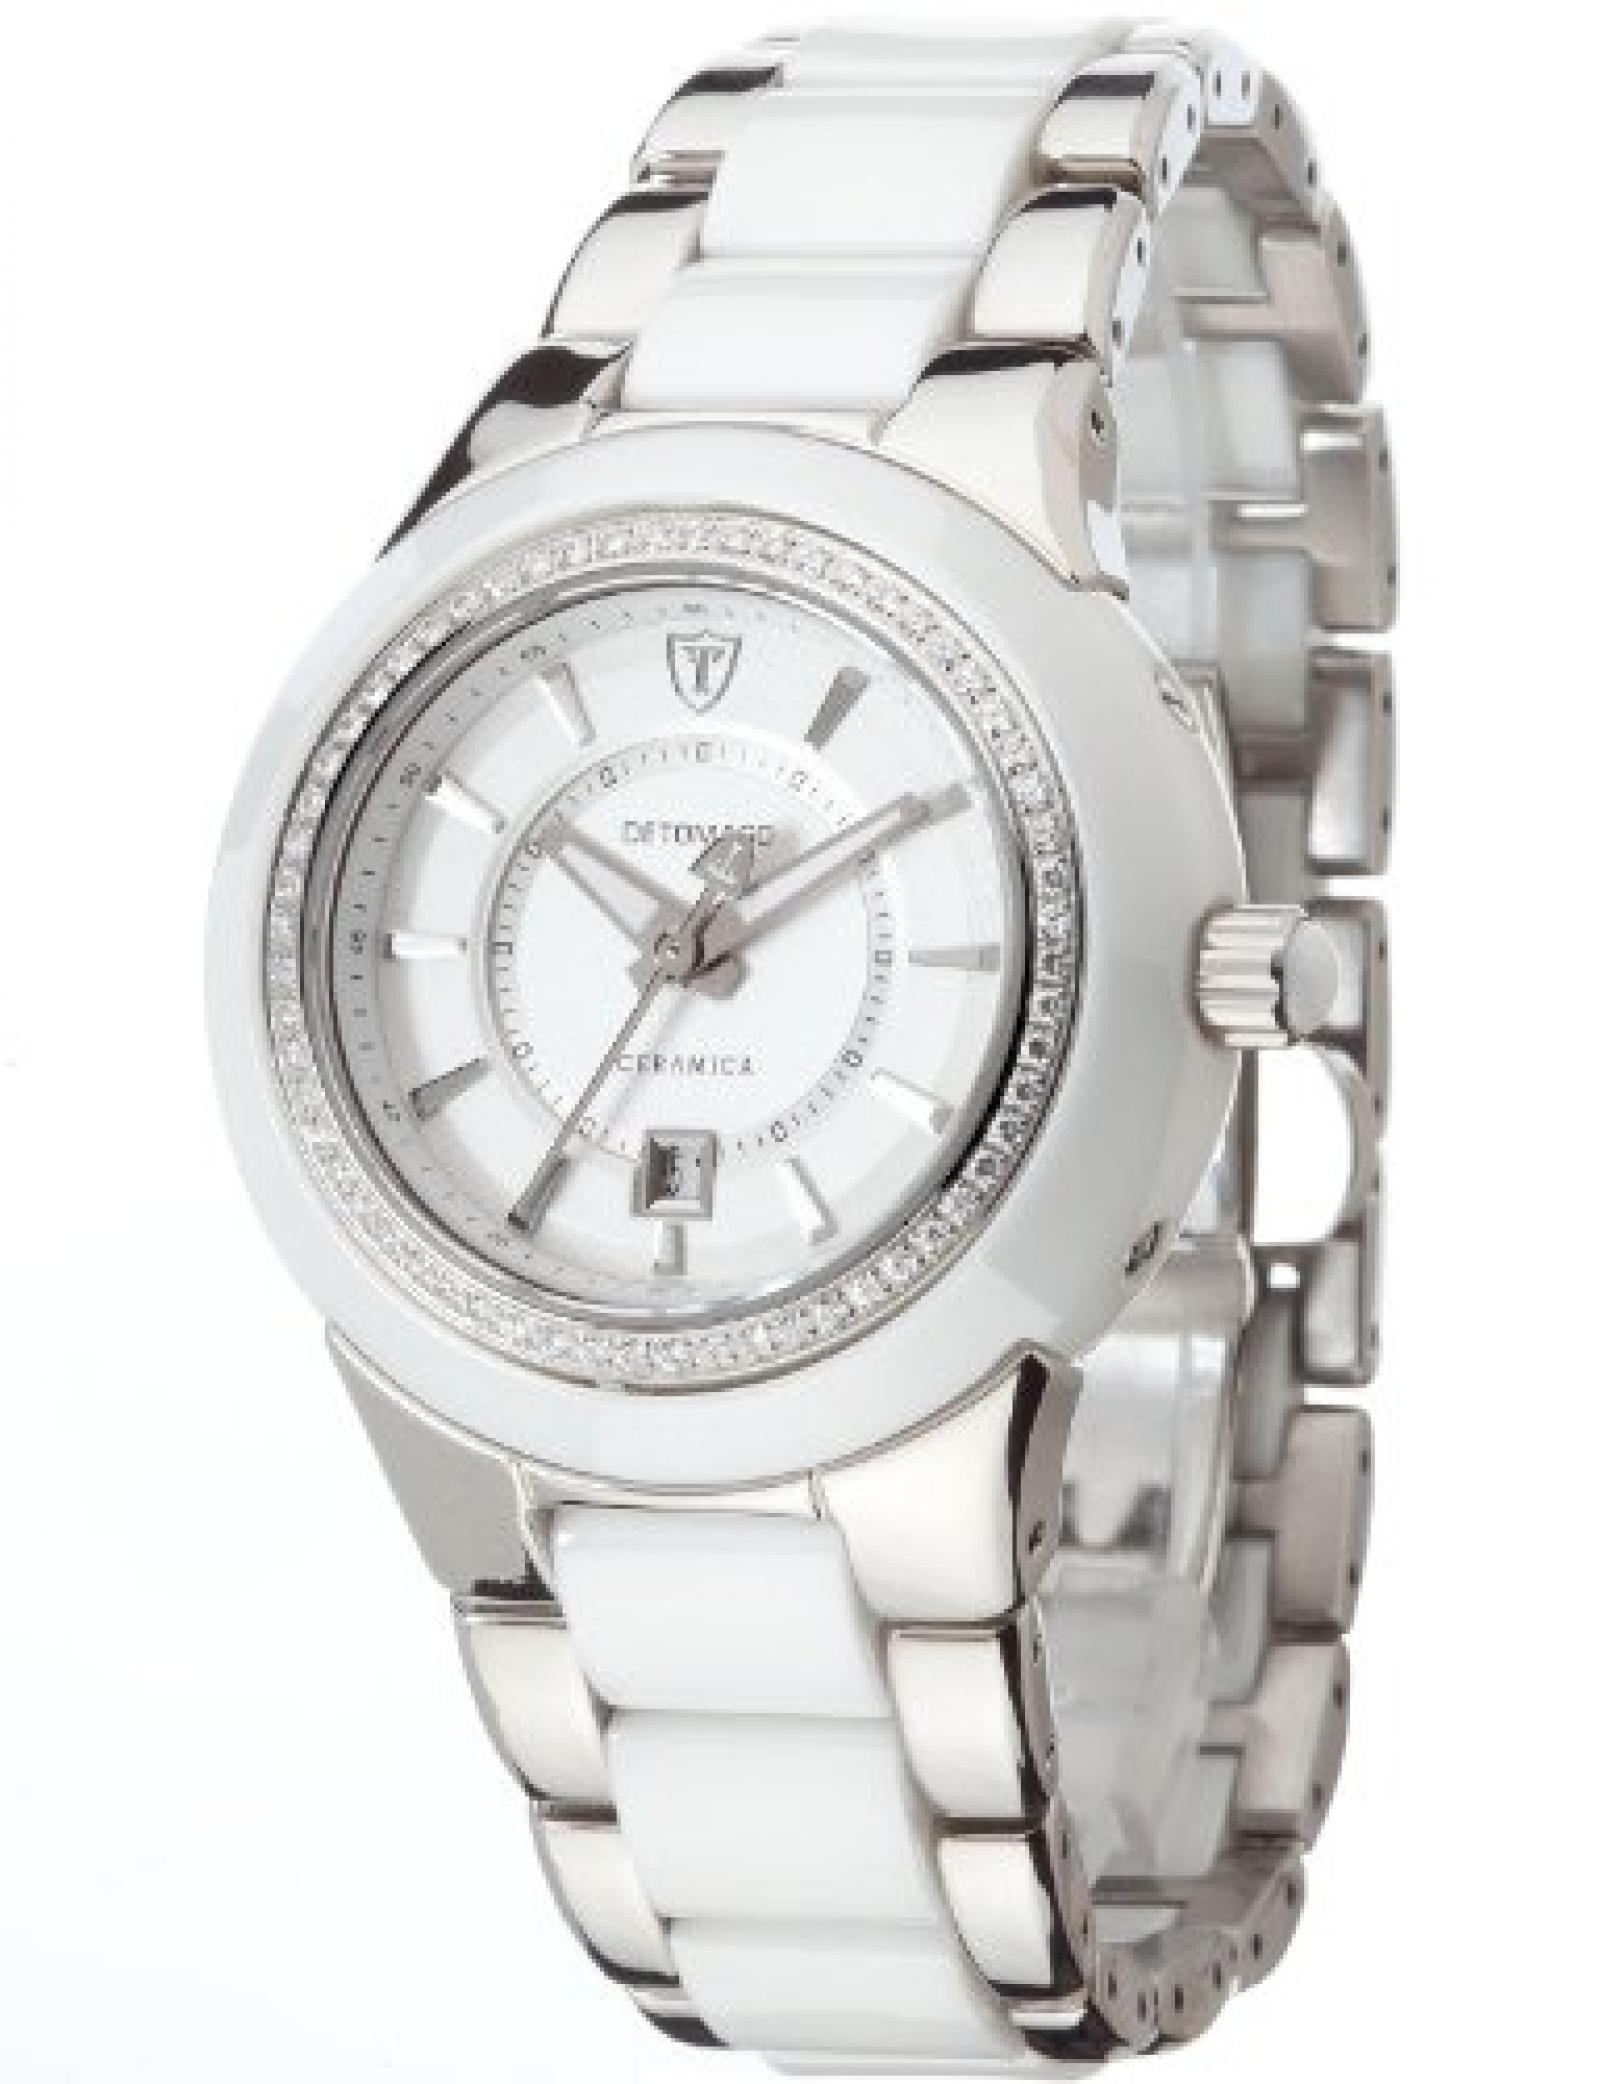 Detomaso Damen-Armbanduhr CARMELA White Ladies Analog Quarz Keramik DT3011-A